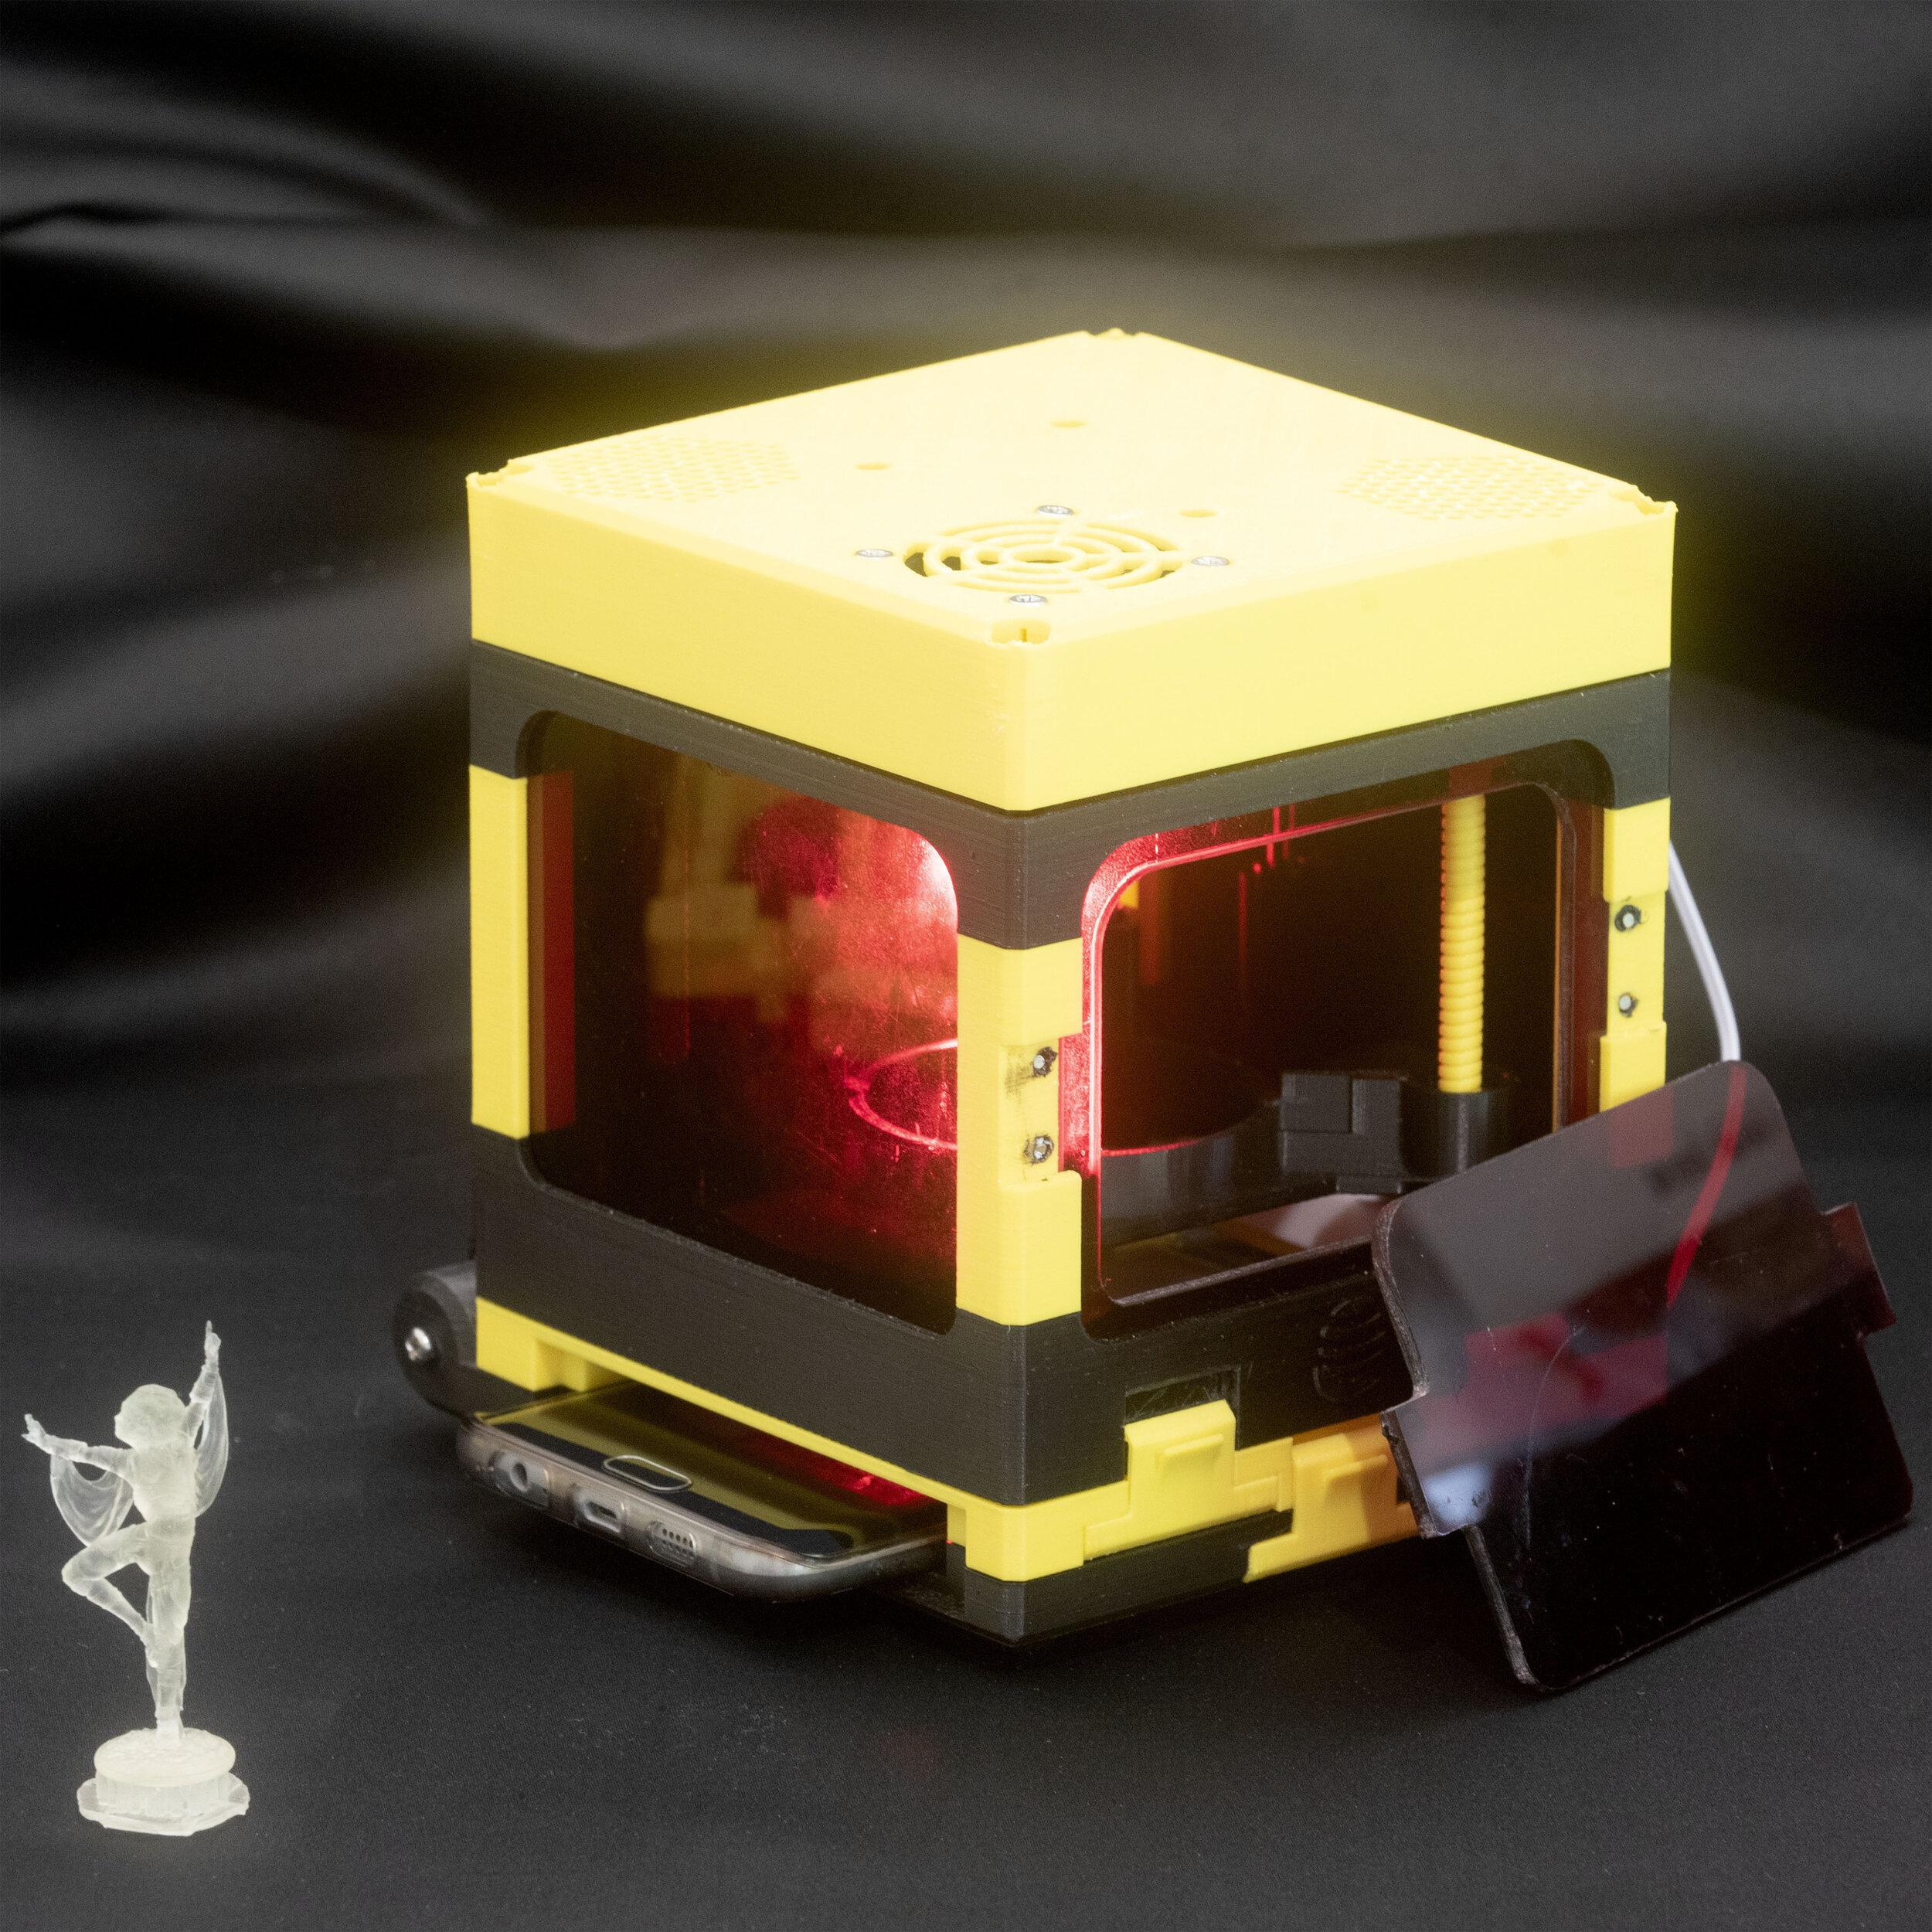 LumiBee the maker 3D printer